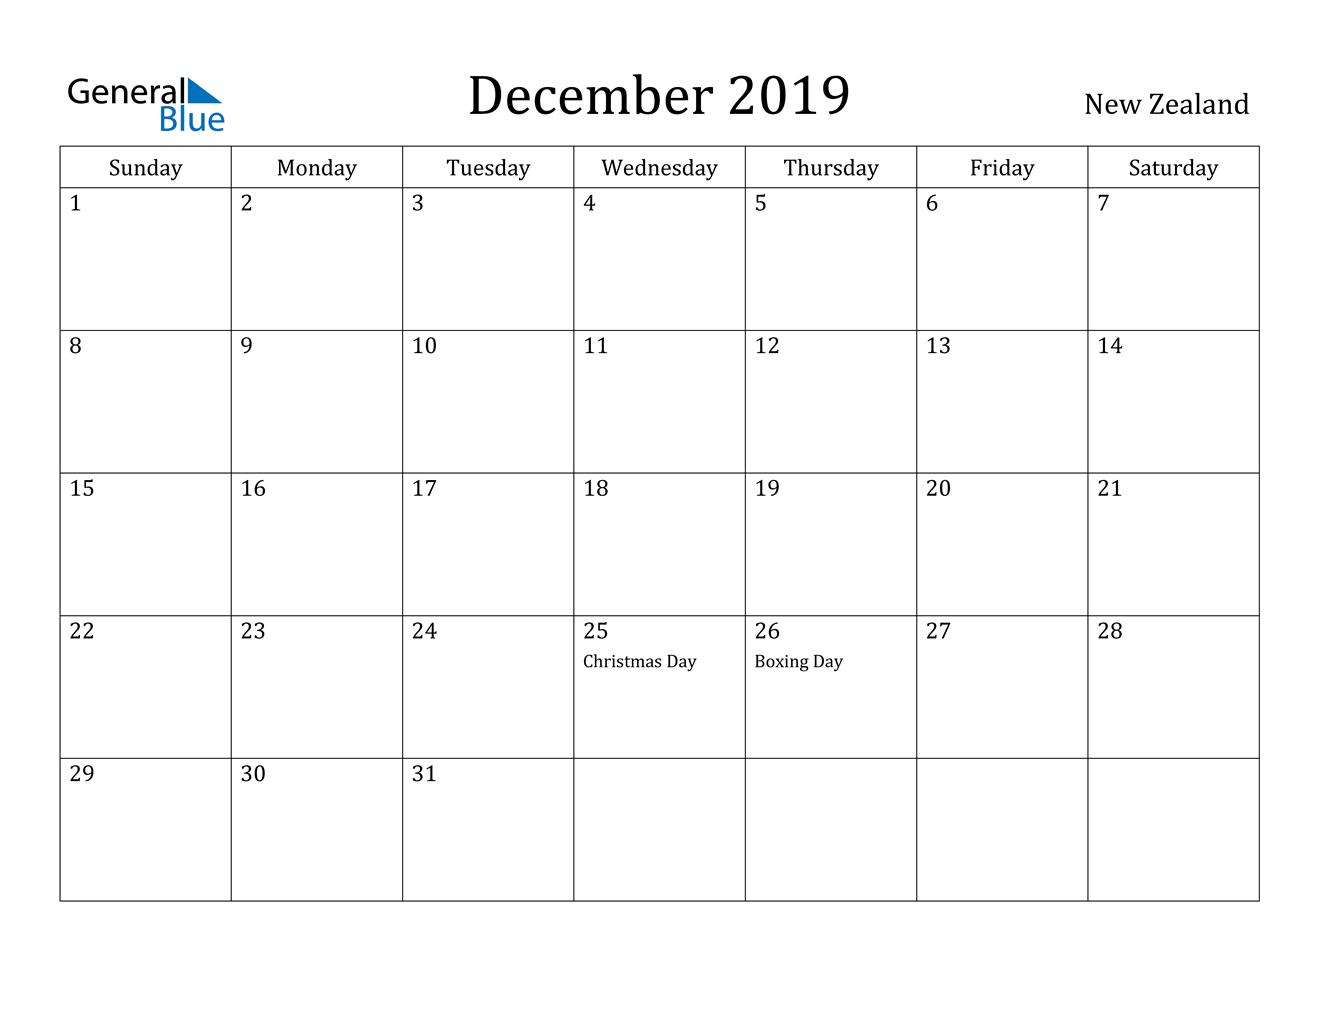 Image of December 2019 New Zealand Calendar with Holidays Calendar